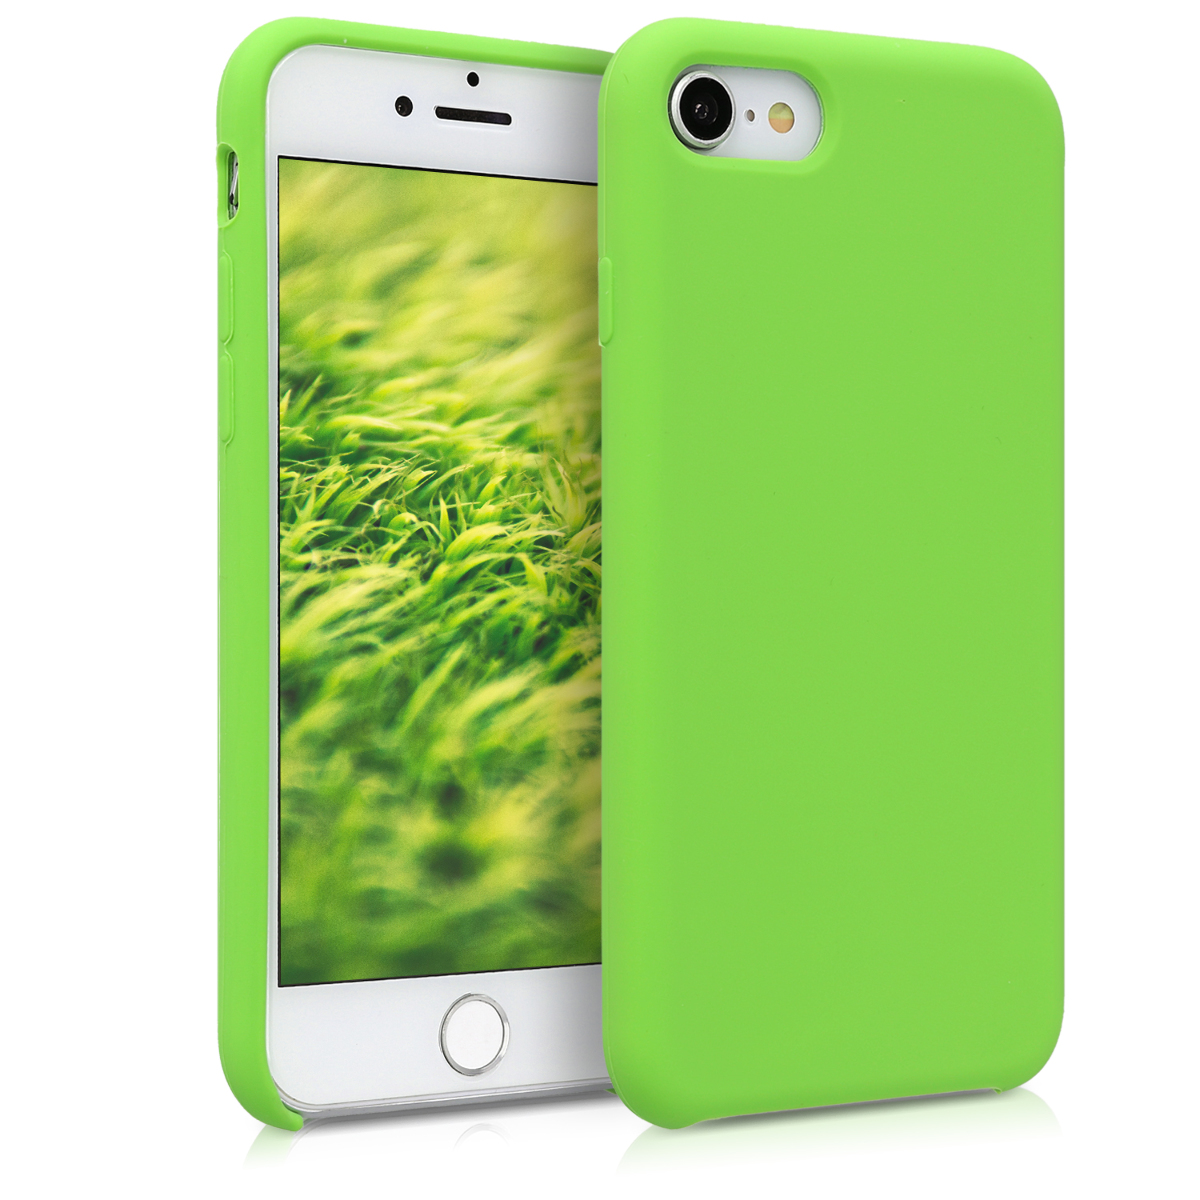 KW TPU Θήκη Σιλικόνης Apple iPhone 7 / 8 - Green (40225.07)